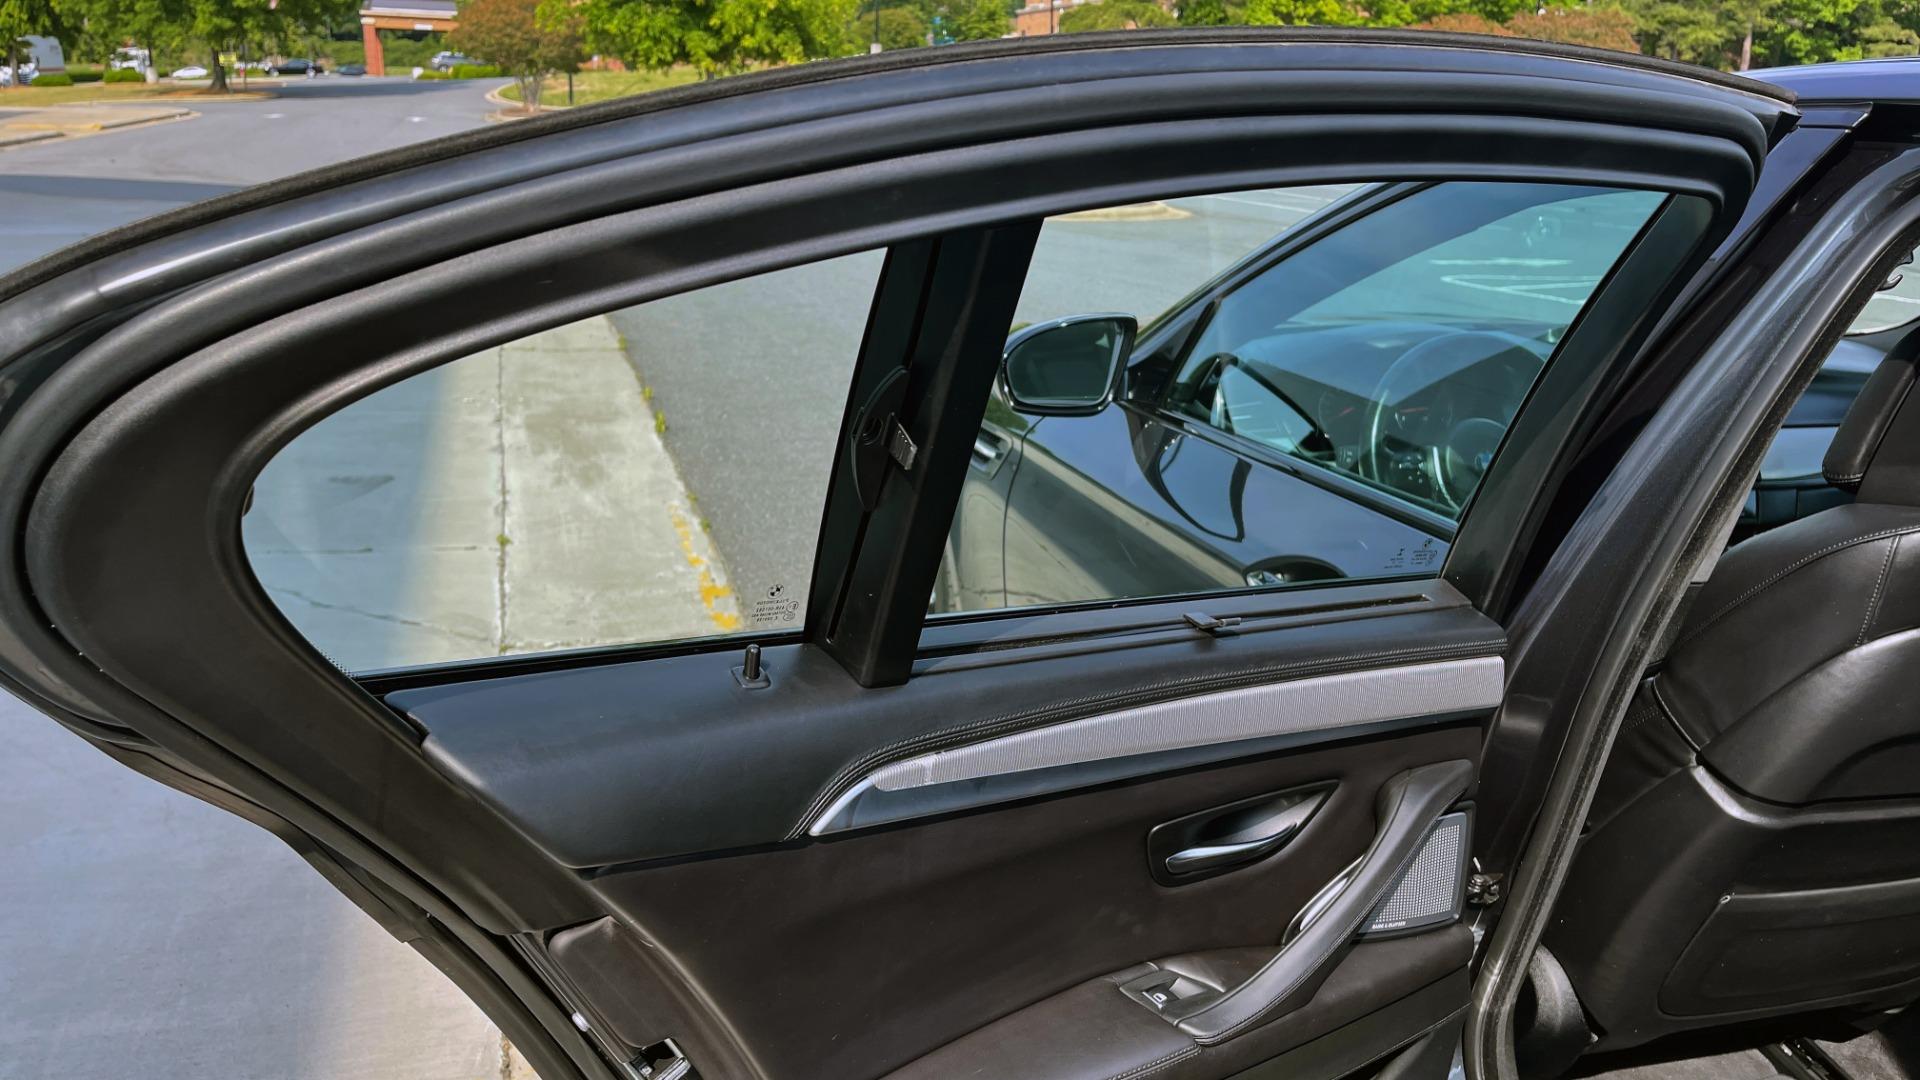 Used 2015 BMW M5 SEDAN / EXEC PKG / HUD / NAV / B&O SND / SUNROOF / REARVIEW for sale Sold at Formula Imports in Charlotte NC 28227 74